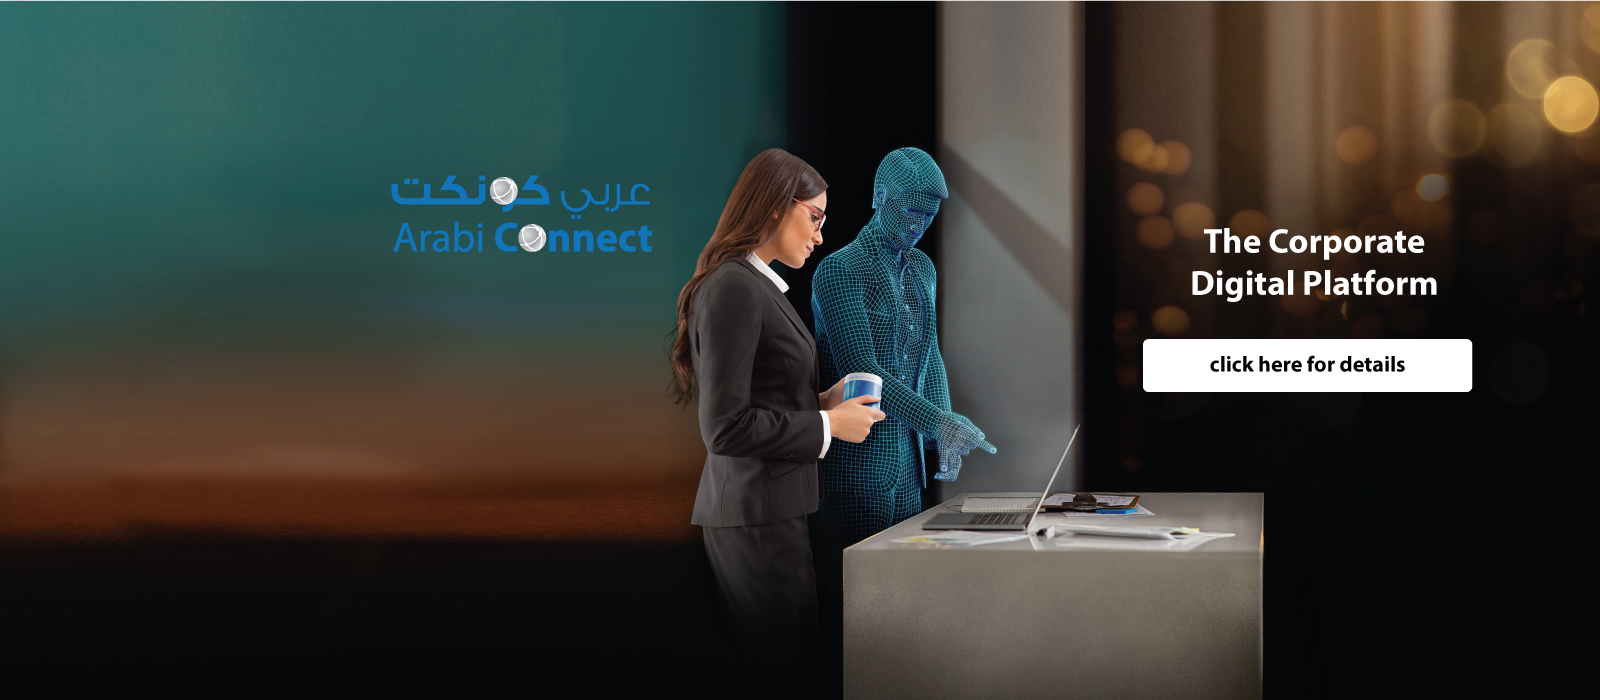 ArabiConnectFemale